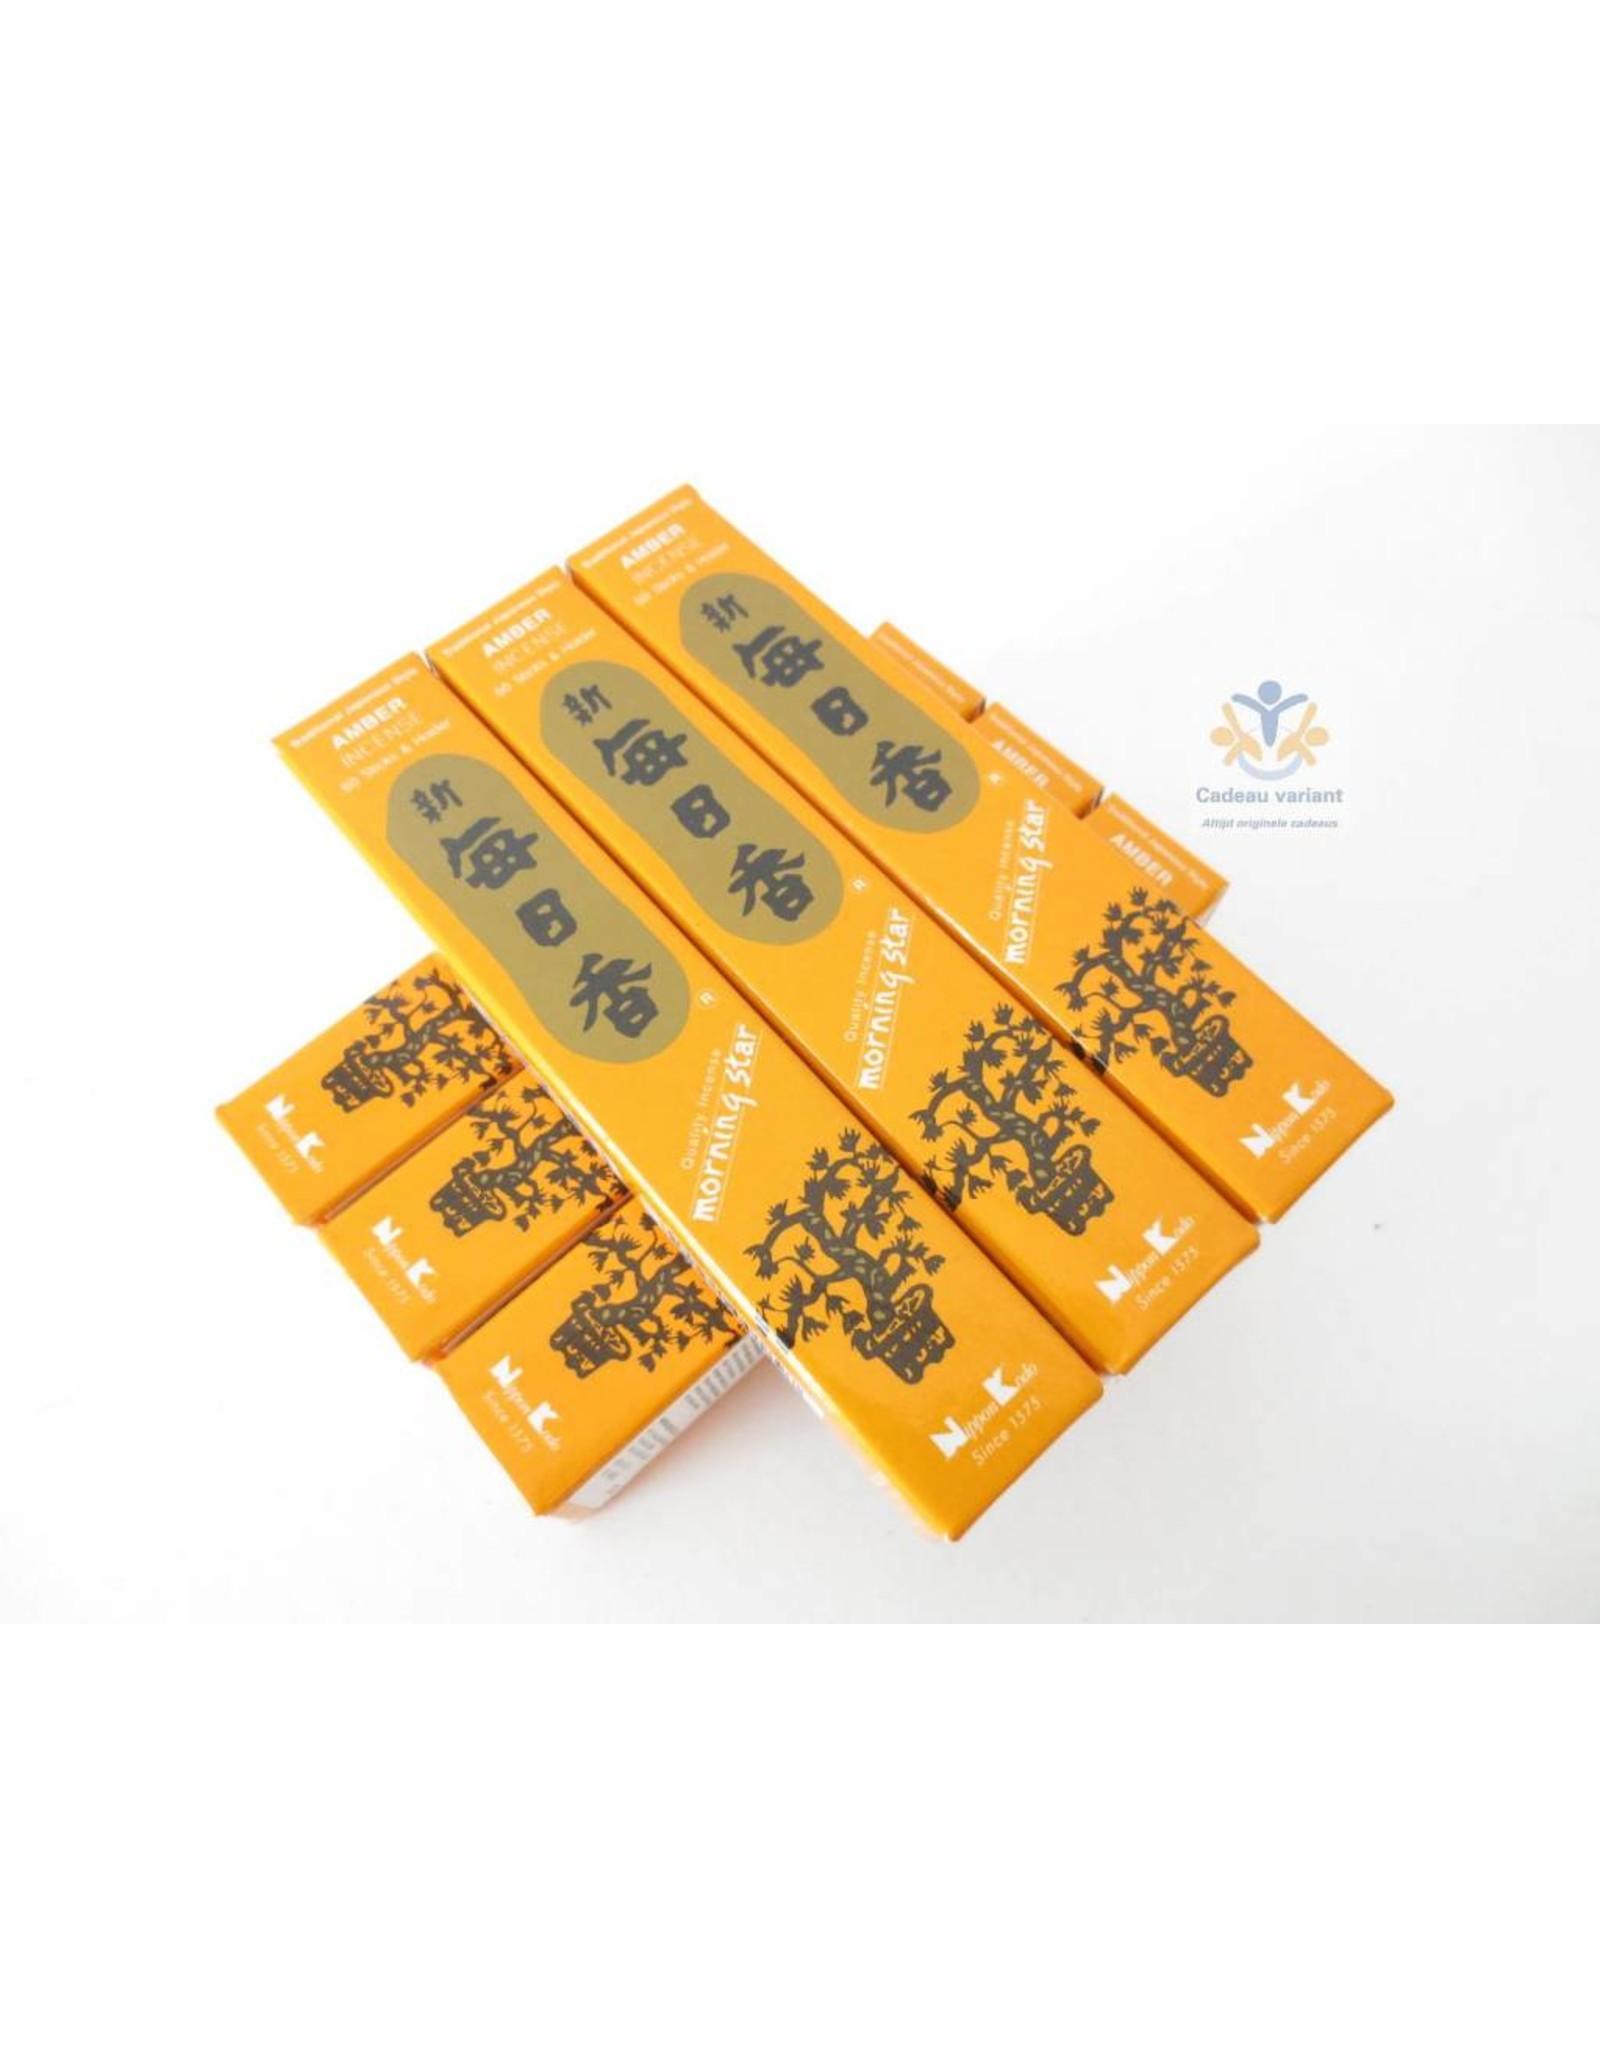 Nippon kodo Wierook amber morningstar